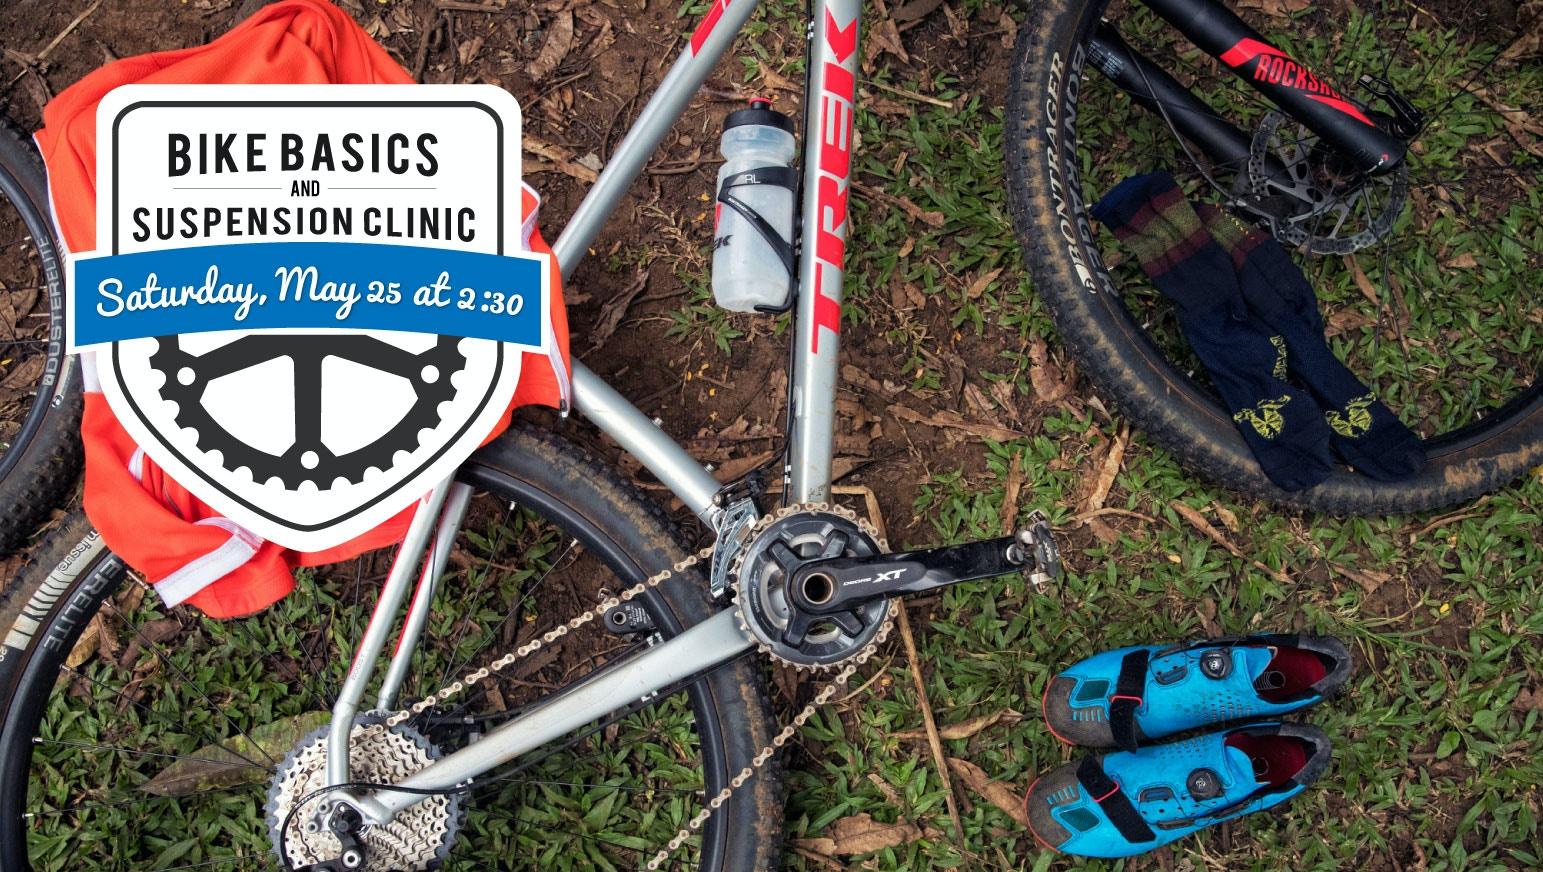 Bike Basics and Suspension Workshop at Tri Bike Run!